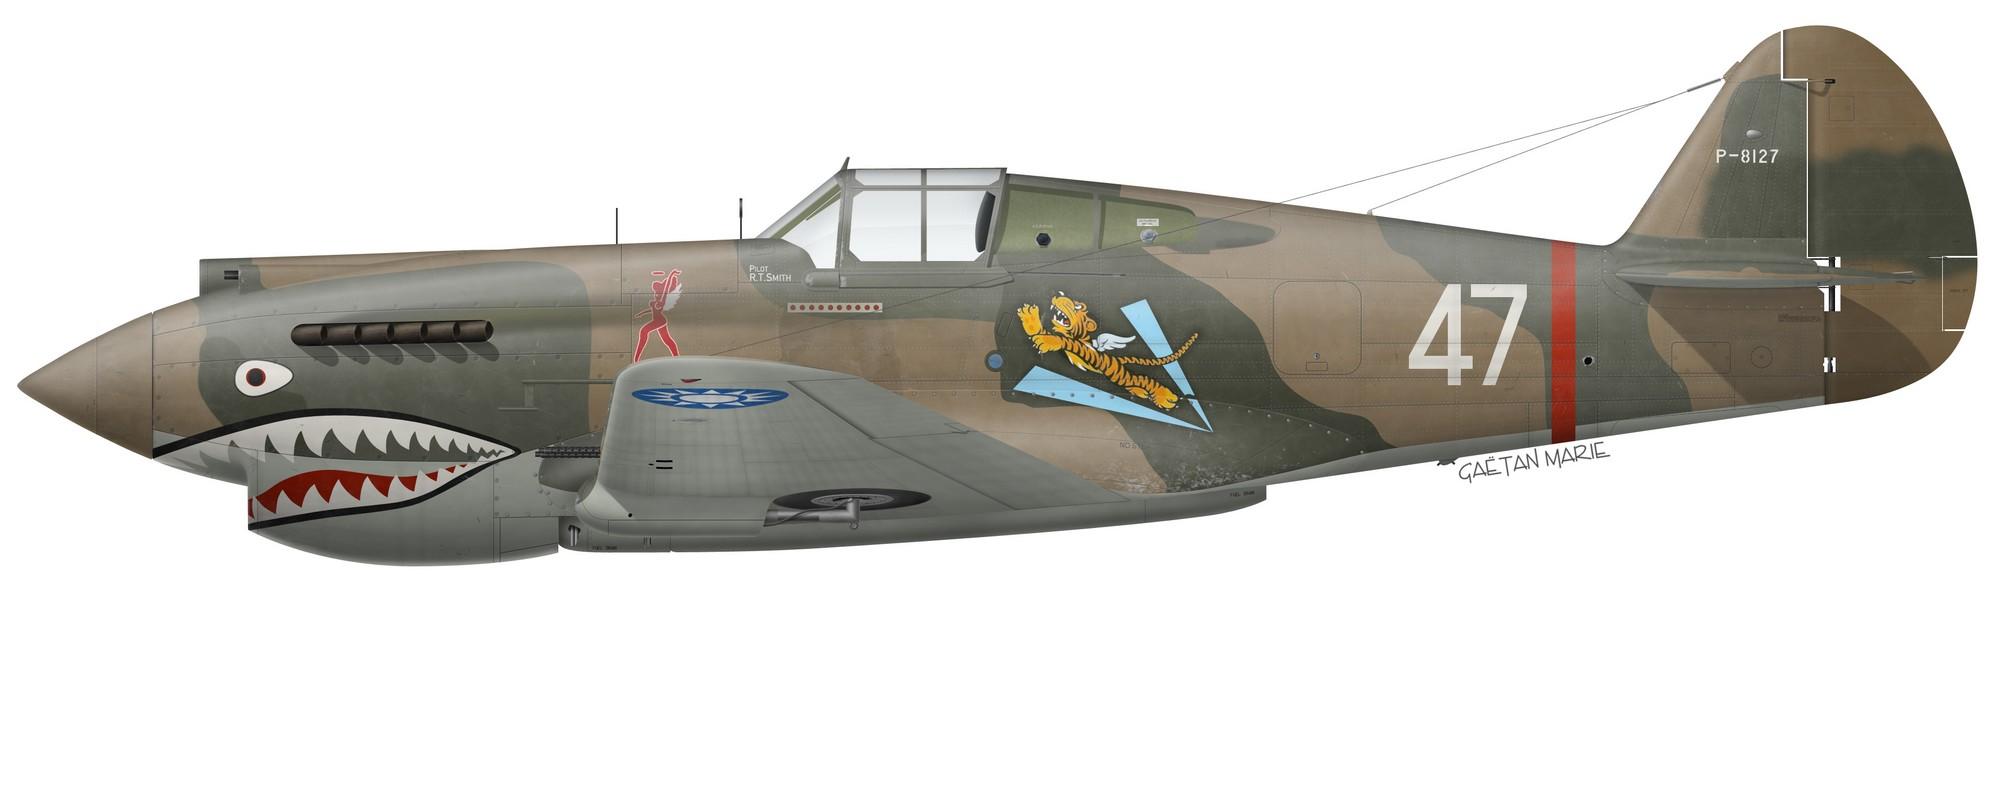 Jean Demozay Print Spitfire Mk Vb Royal Air Force par G. Marie No 91 Sqdn